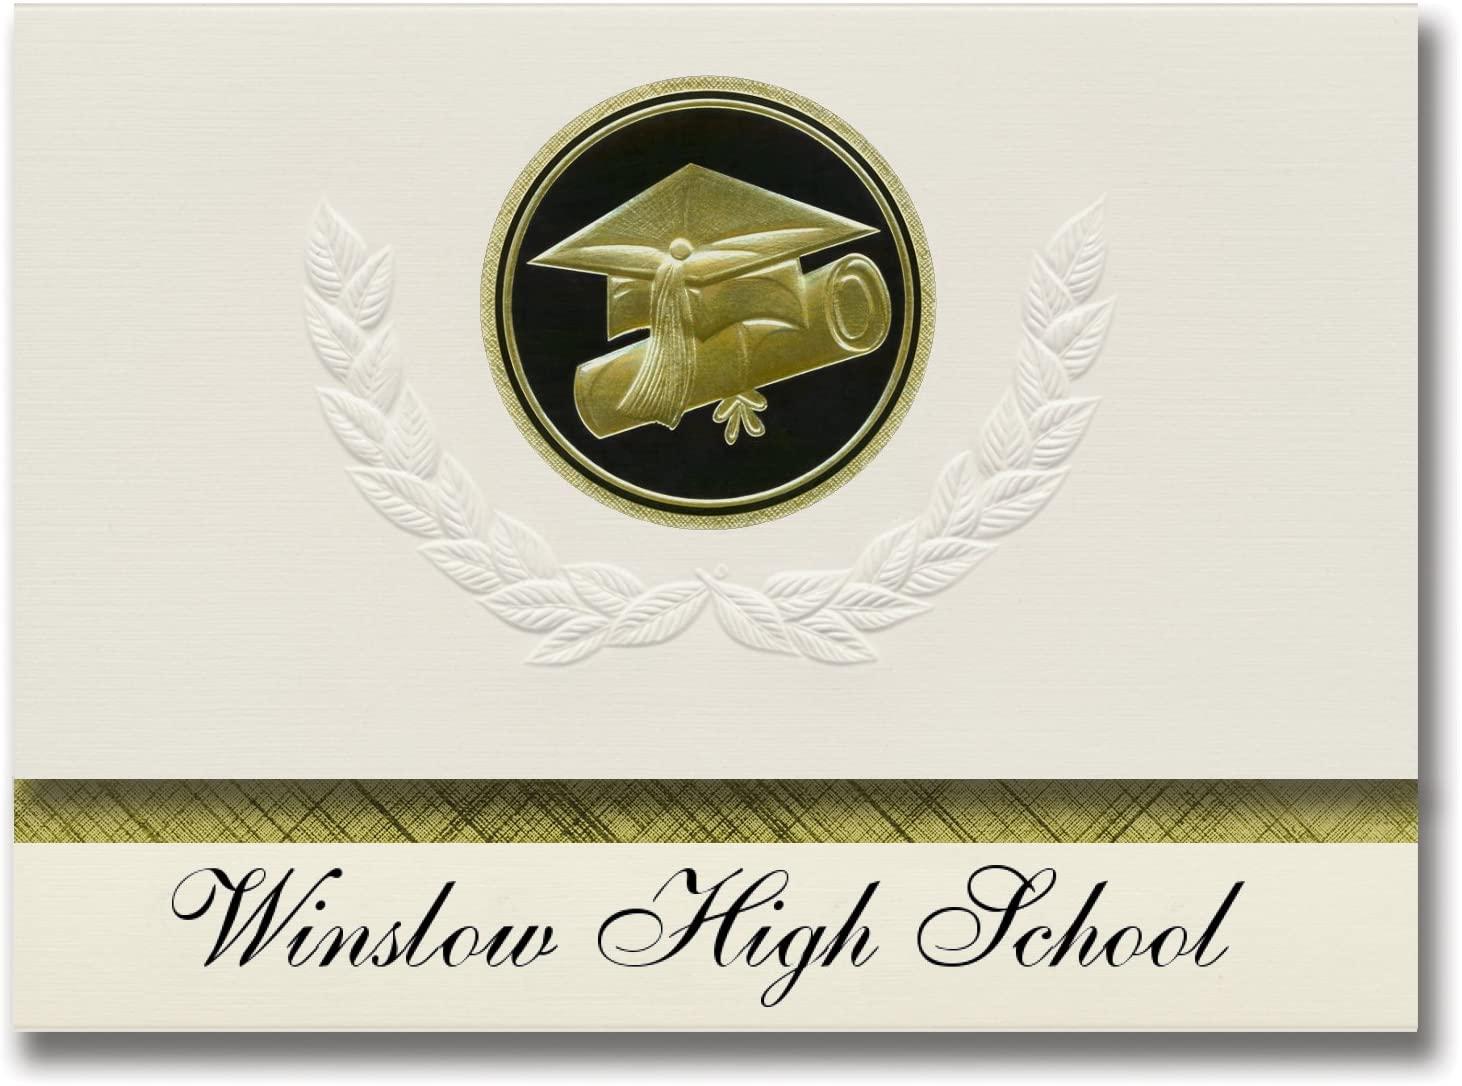 Signature Announcements Winslow High School (Winslow, AZ) Graduation Announcements, Presidential style, Elite package of 25 Cap & Diploma Seal. Black & Gold.